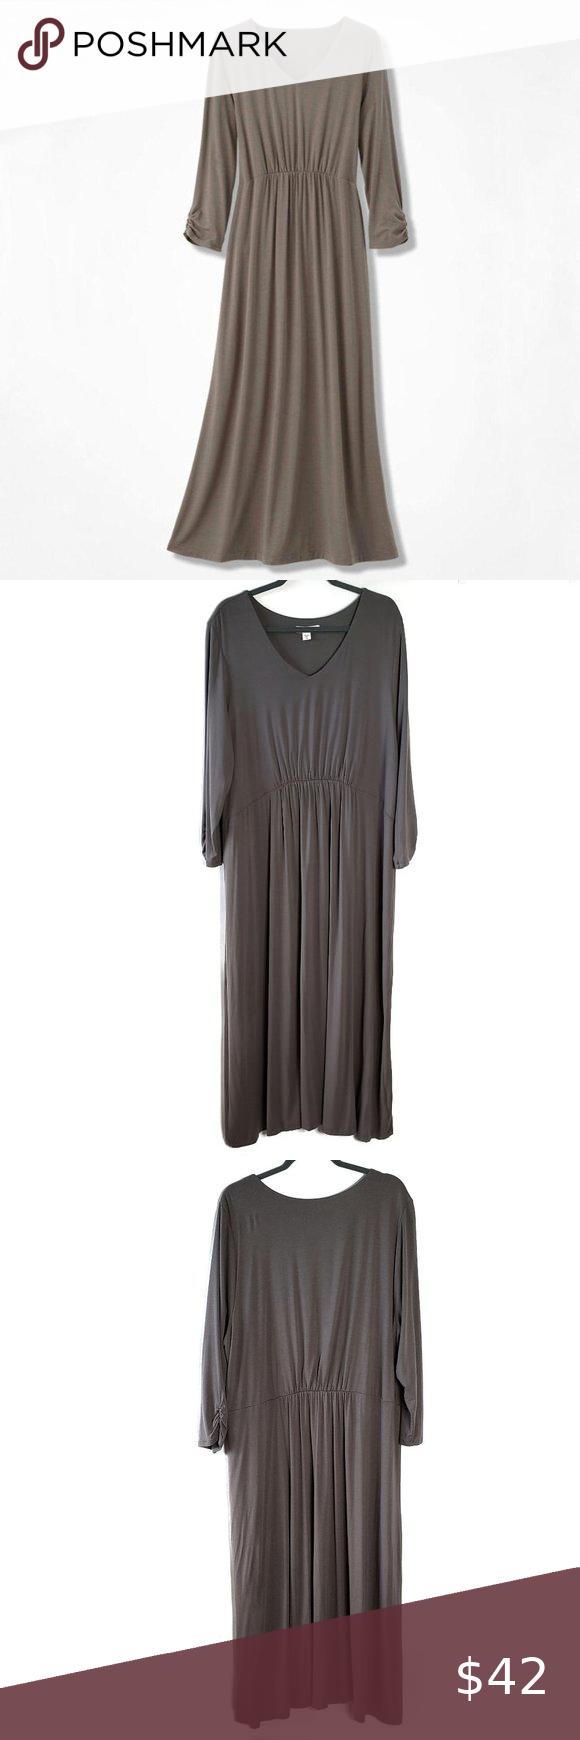 Coldwater Creek Plus Size Maxi Dress Sz 2x Vneck Plus Size Maxi Dresses Solid Maxi Dress Plus Size Maxi [ 1740 x 580 Pixel ]